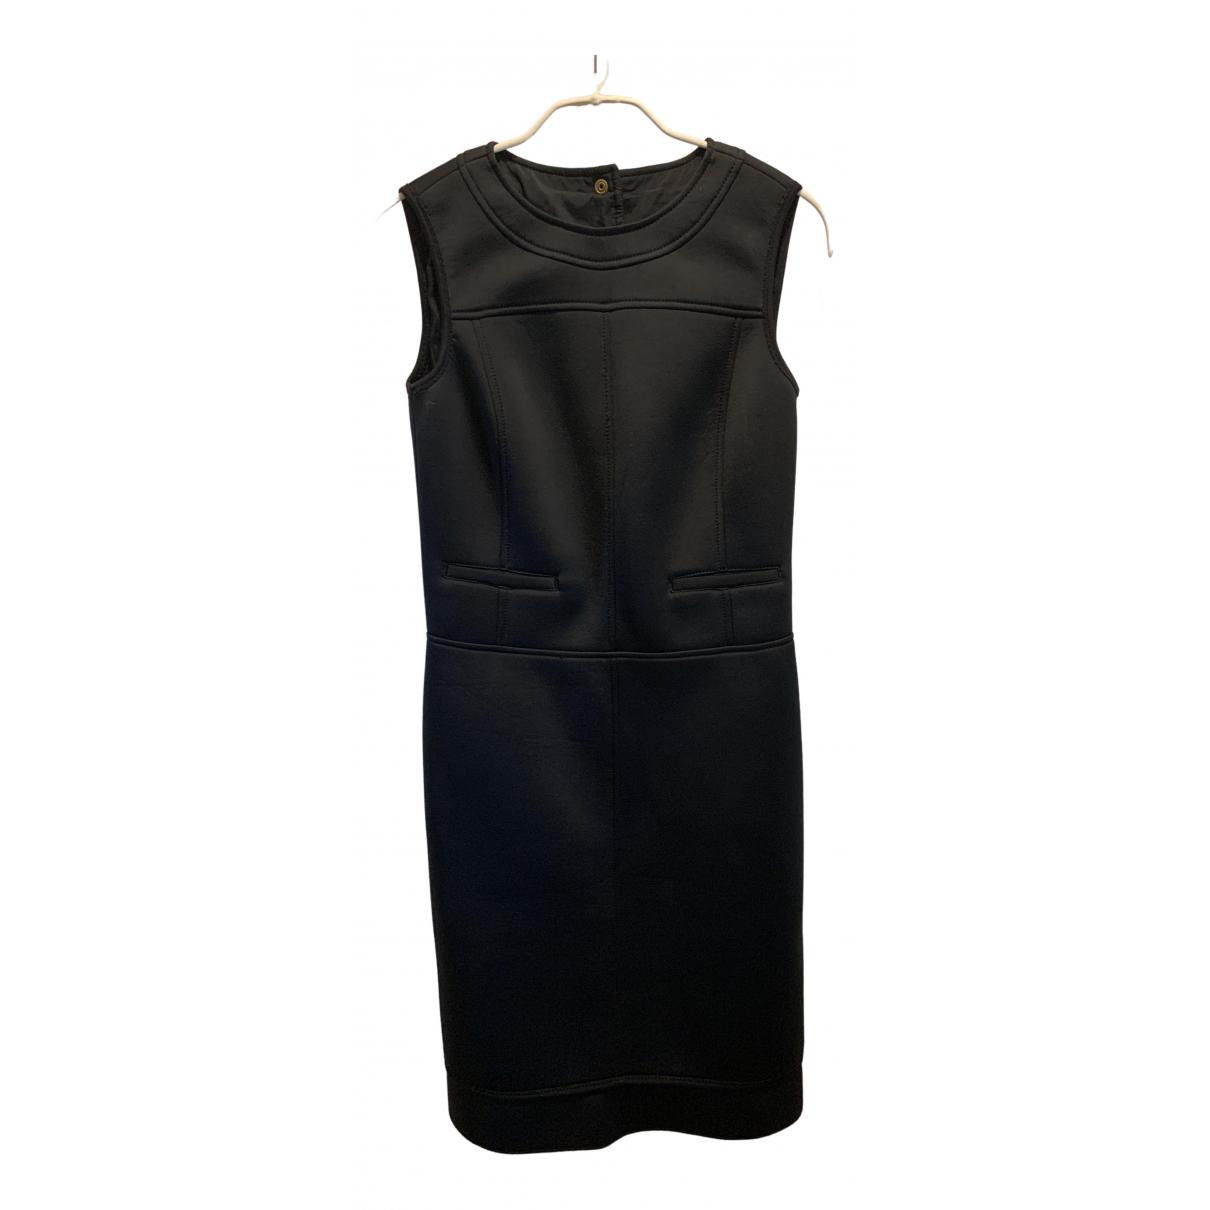 M Missoni \N Black Patent leather dress for Women 38 IT